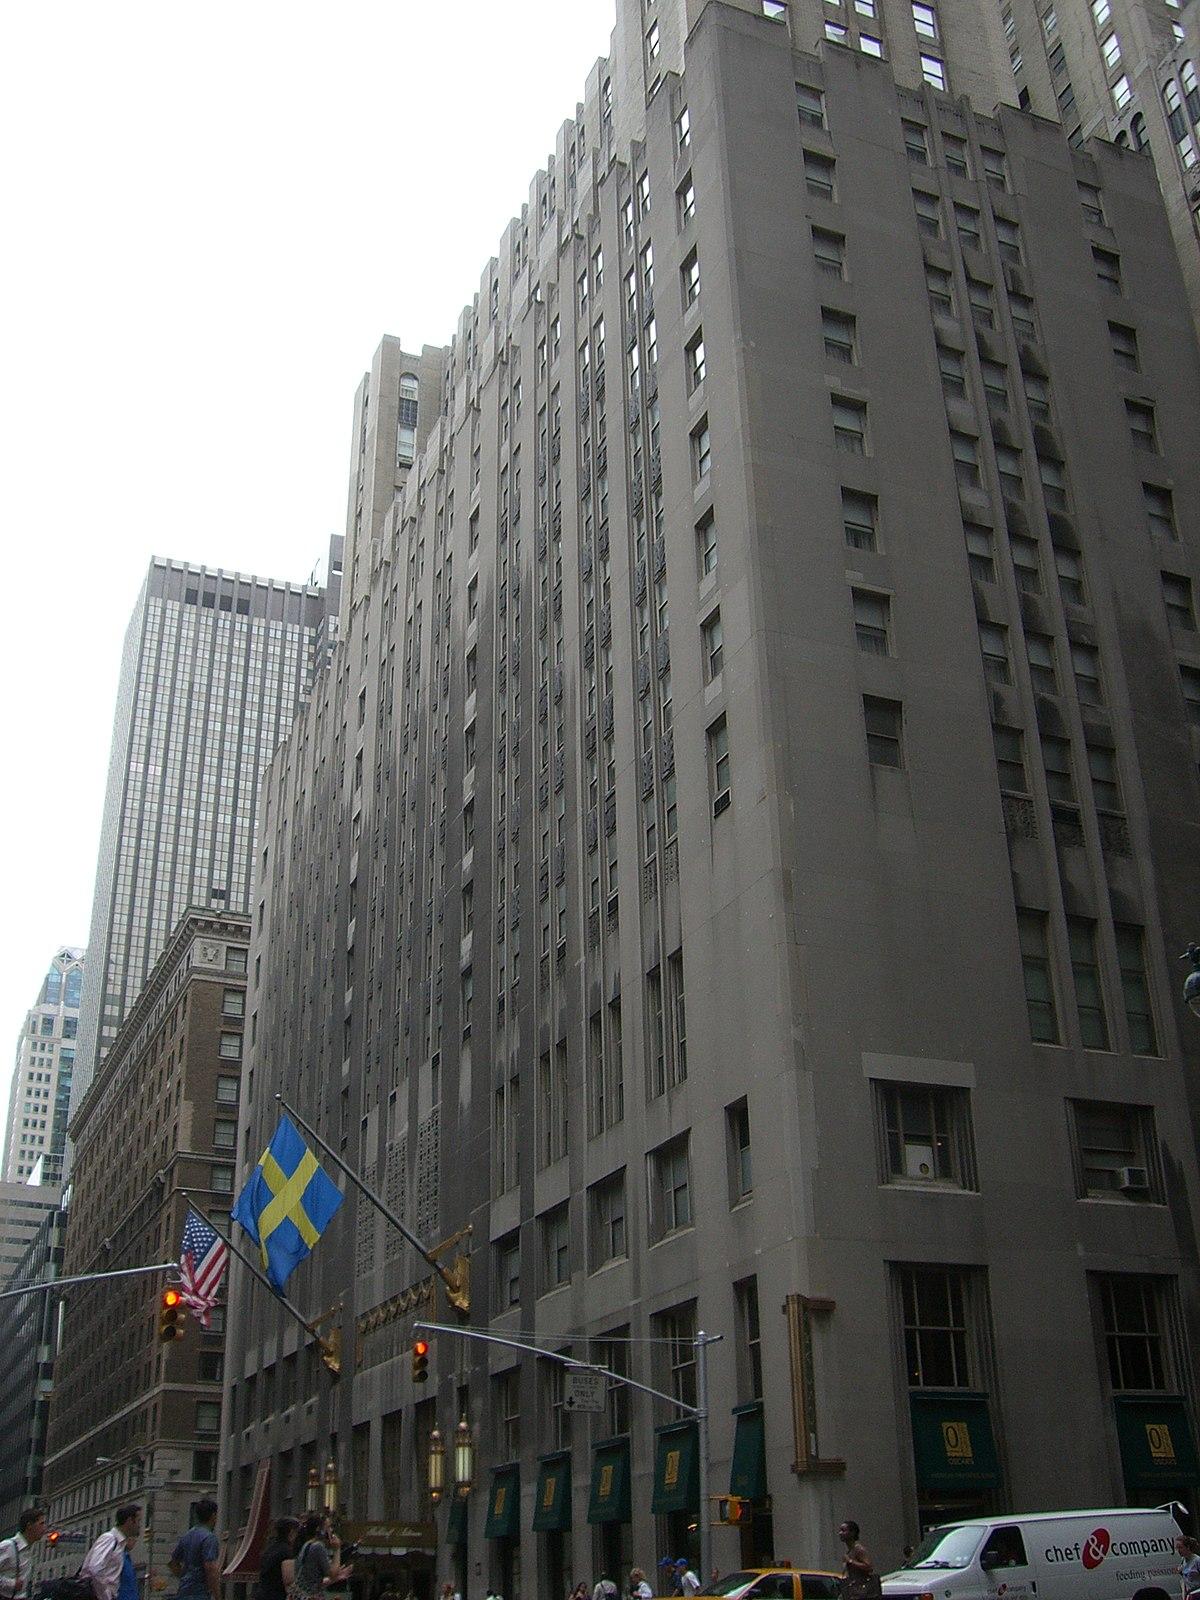 Waldorf astoria wikipedia la enciclopedia libre for Hotel waldorf astoria